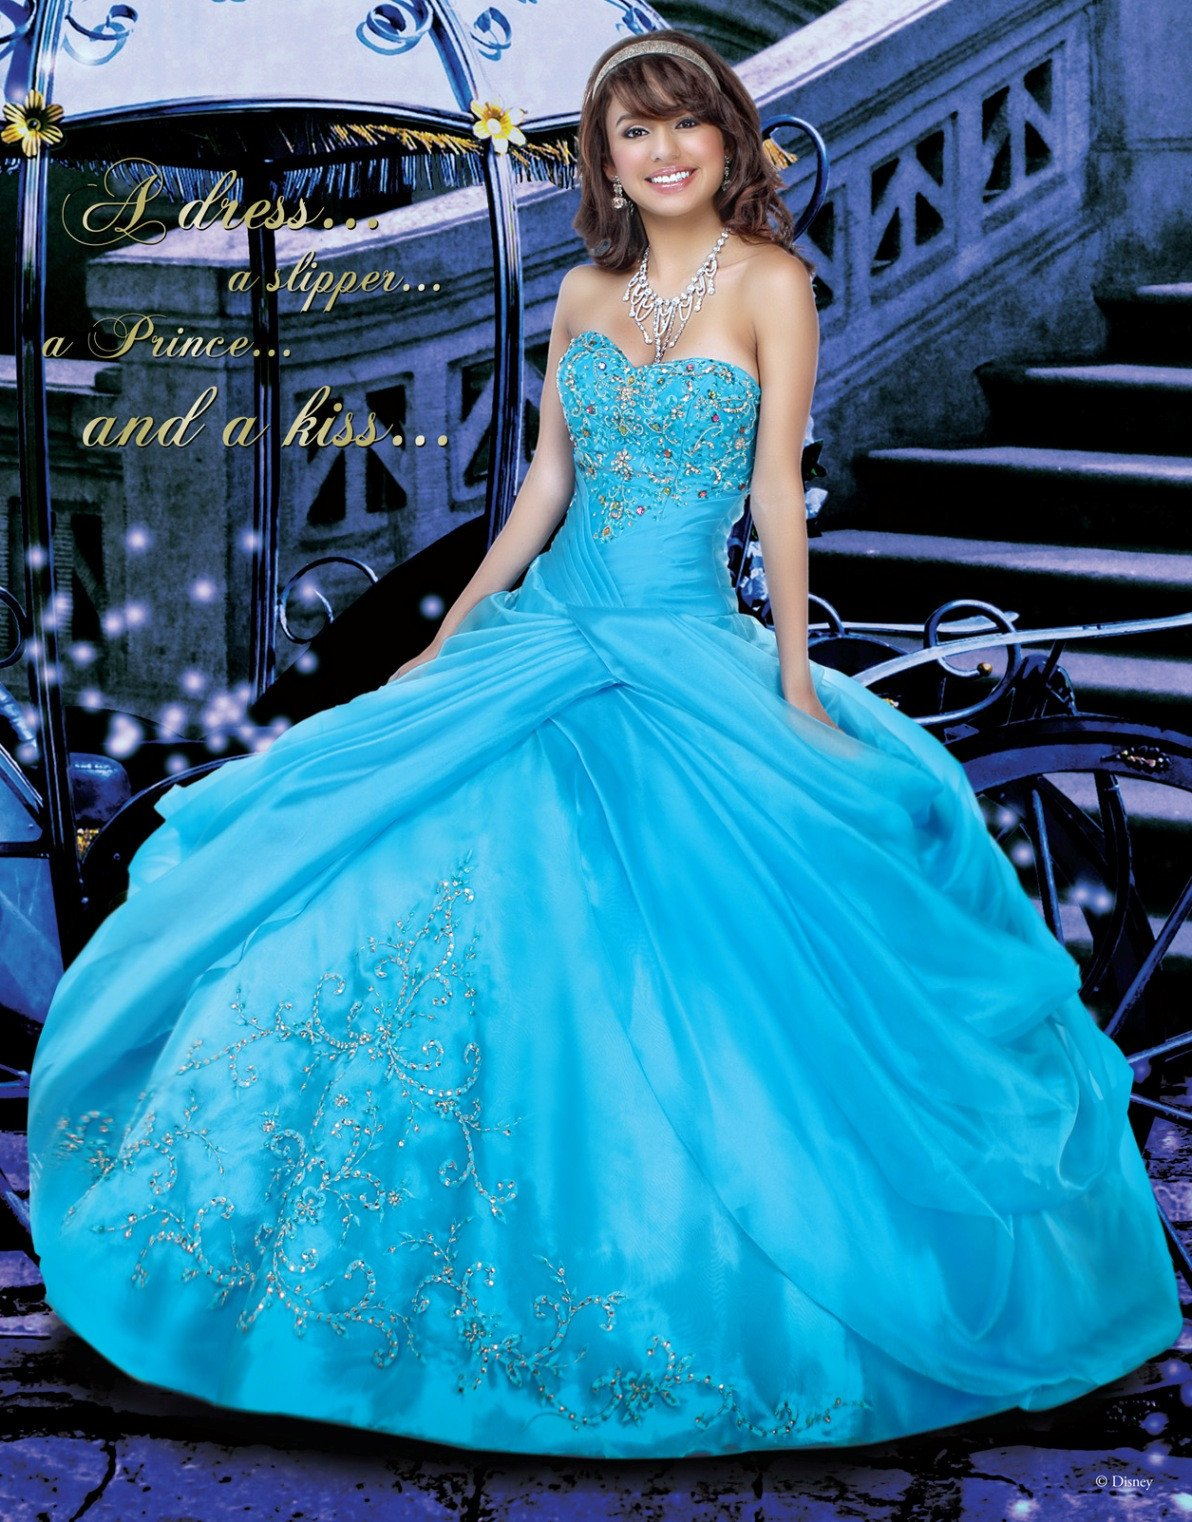 Disney Royal Ball Quinceanera Dress Cinderella Style 41003 | Royals ...